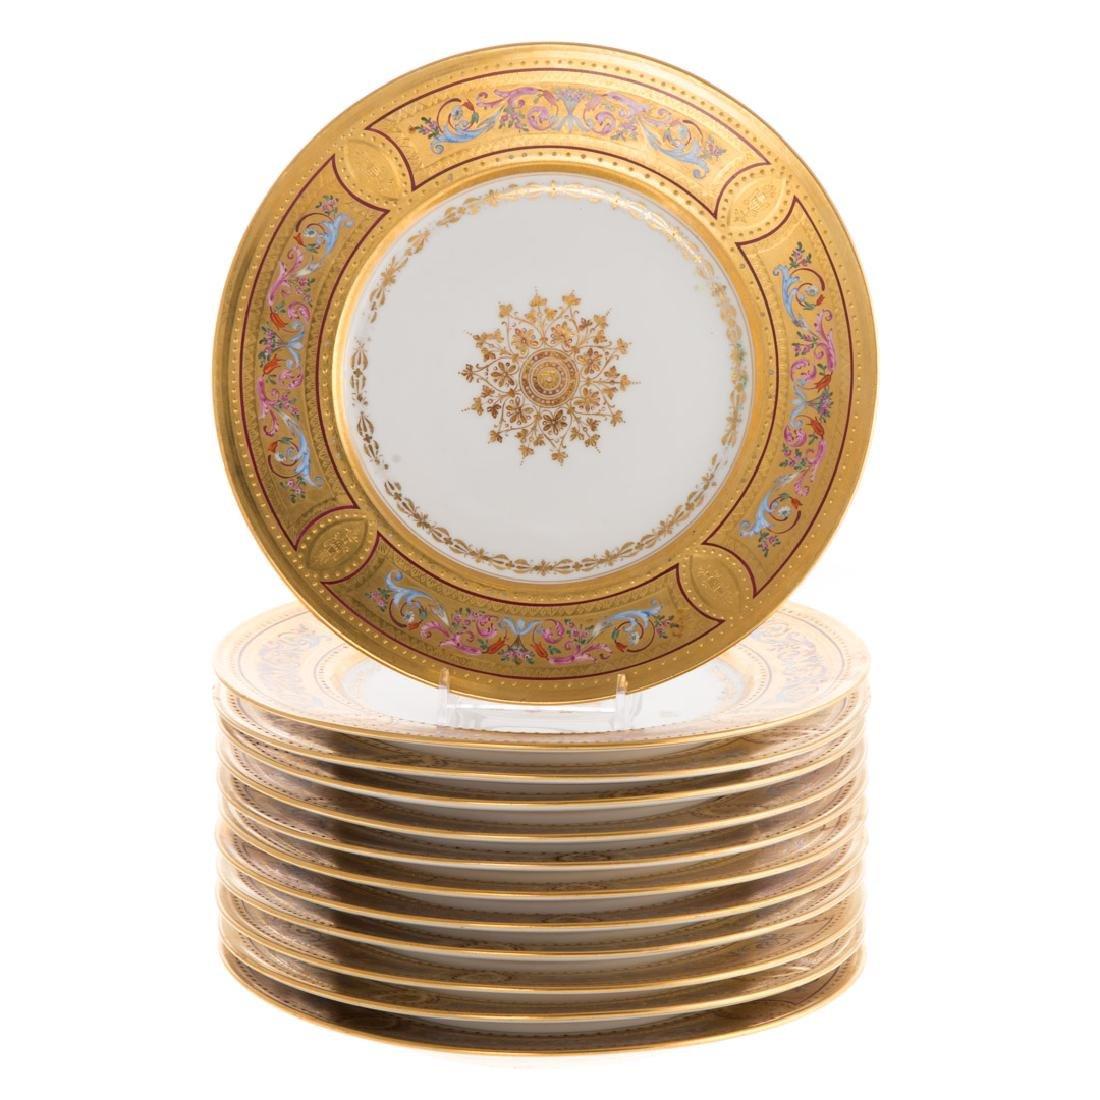 12 Vienna porcelain gilt & enamel decorated plates